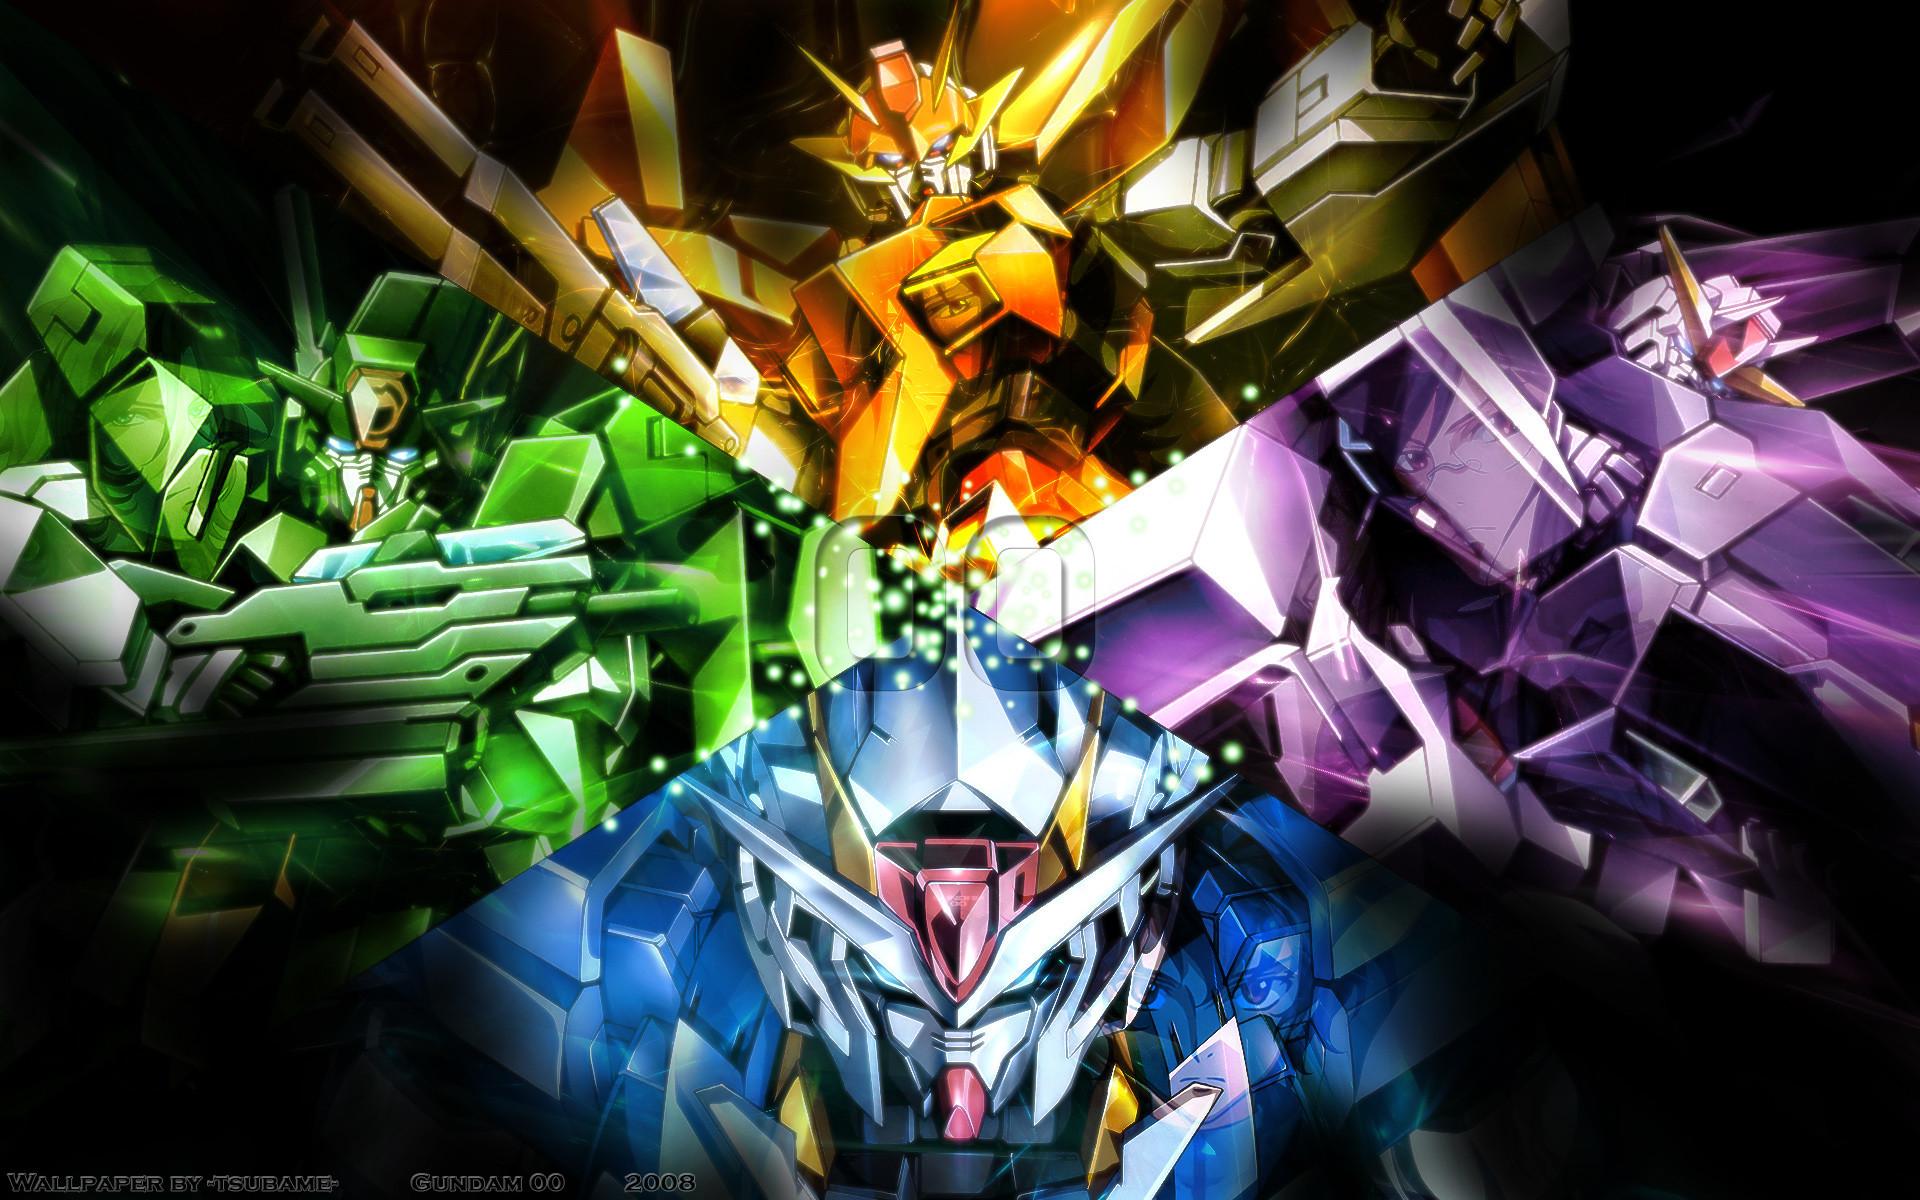 Mobile Suit Gundam 00 Wallpapers